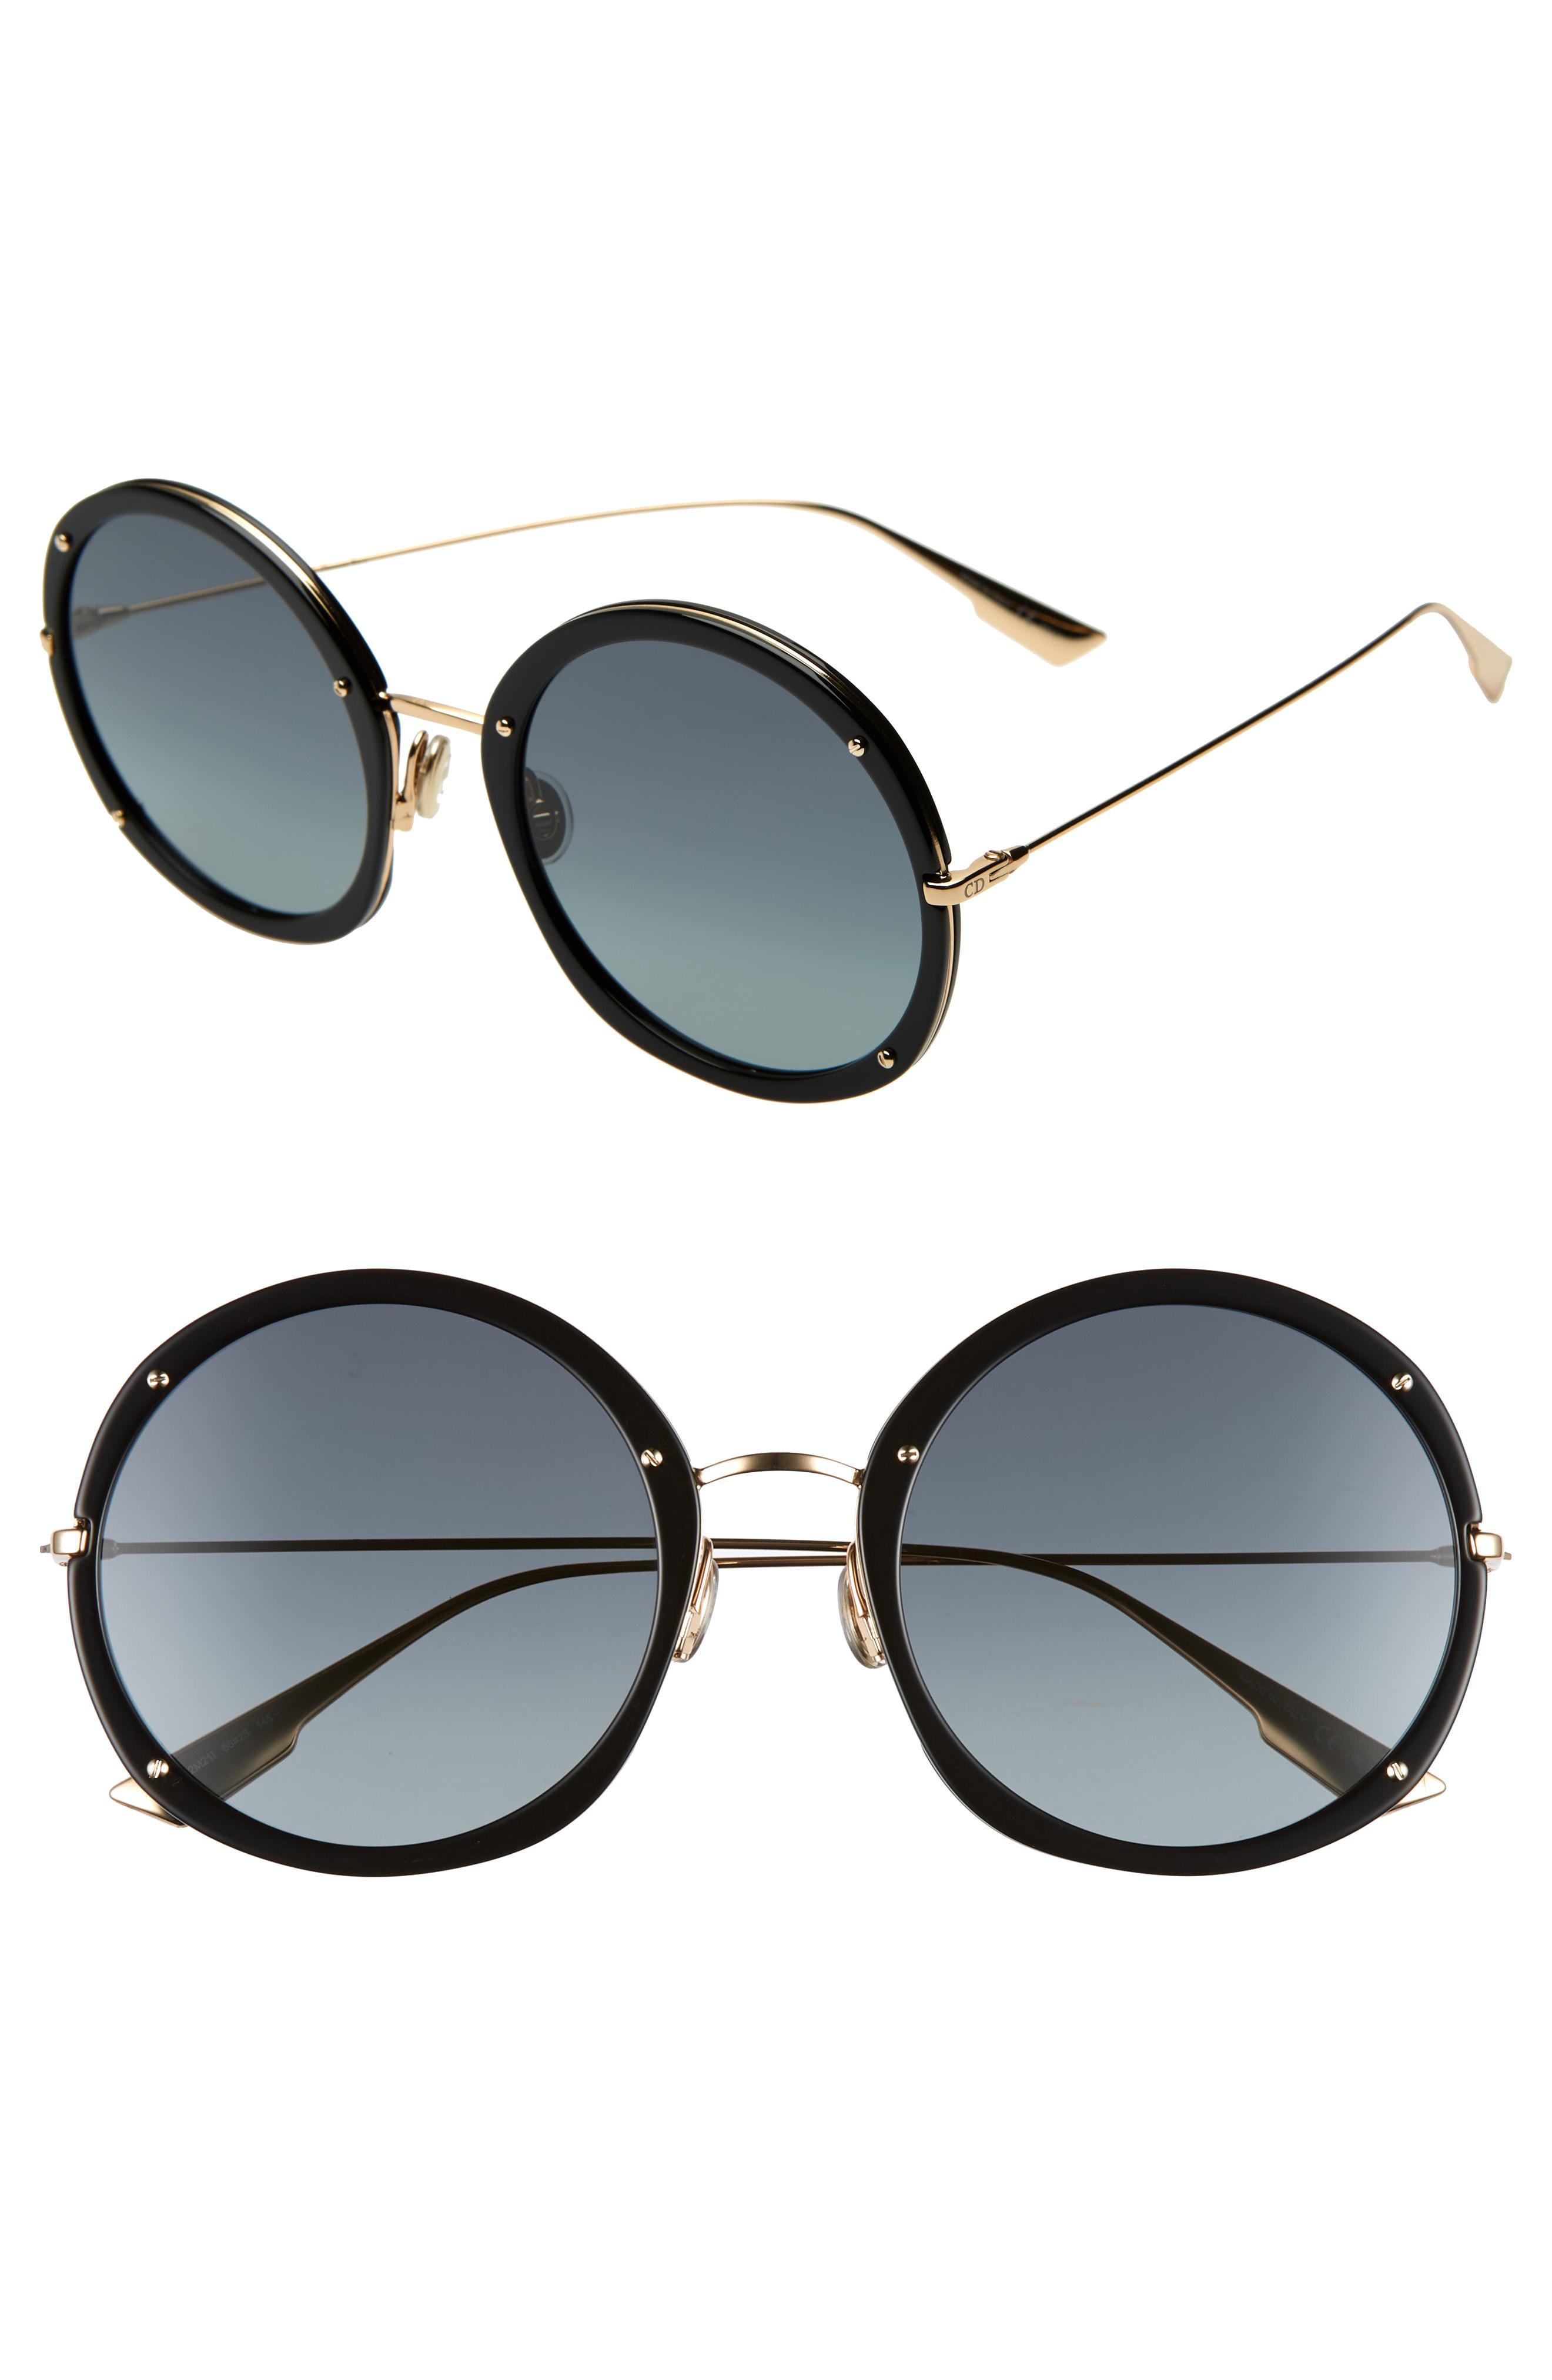 30df05869e3 Lyst - Dior Hypnotic 56mm Round Sunglasses in Black